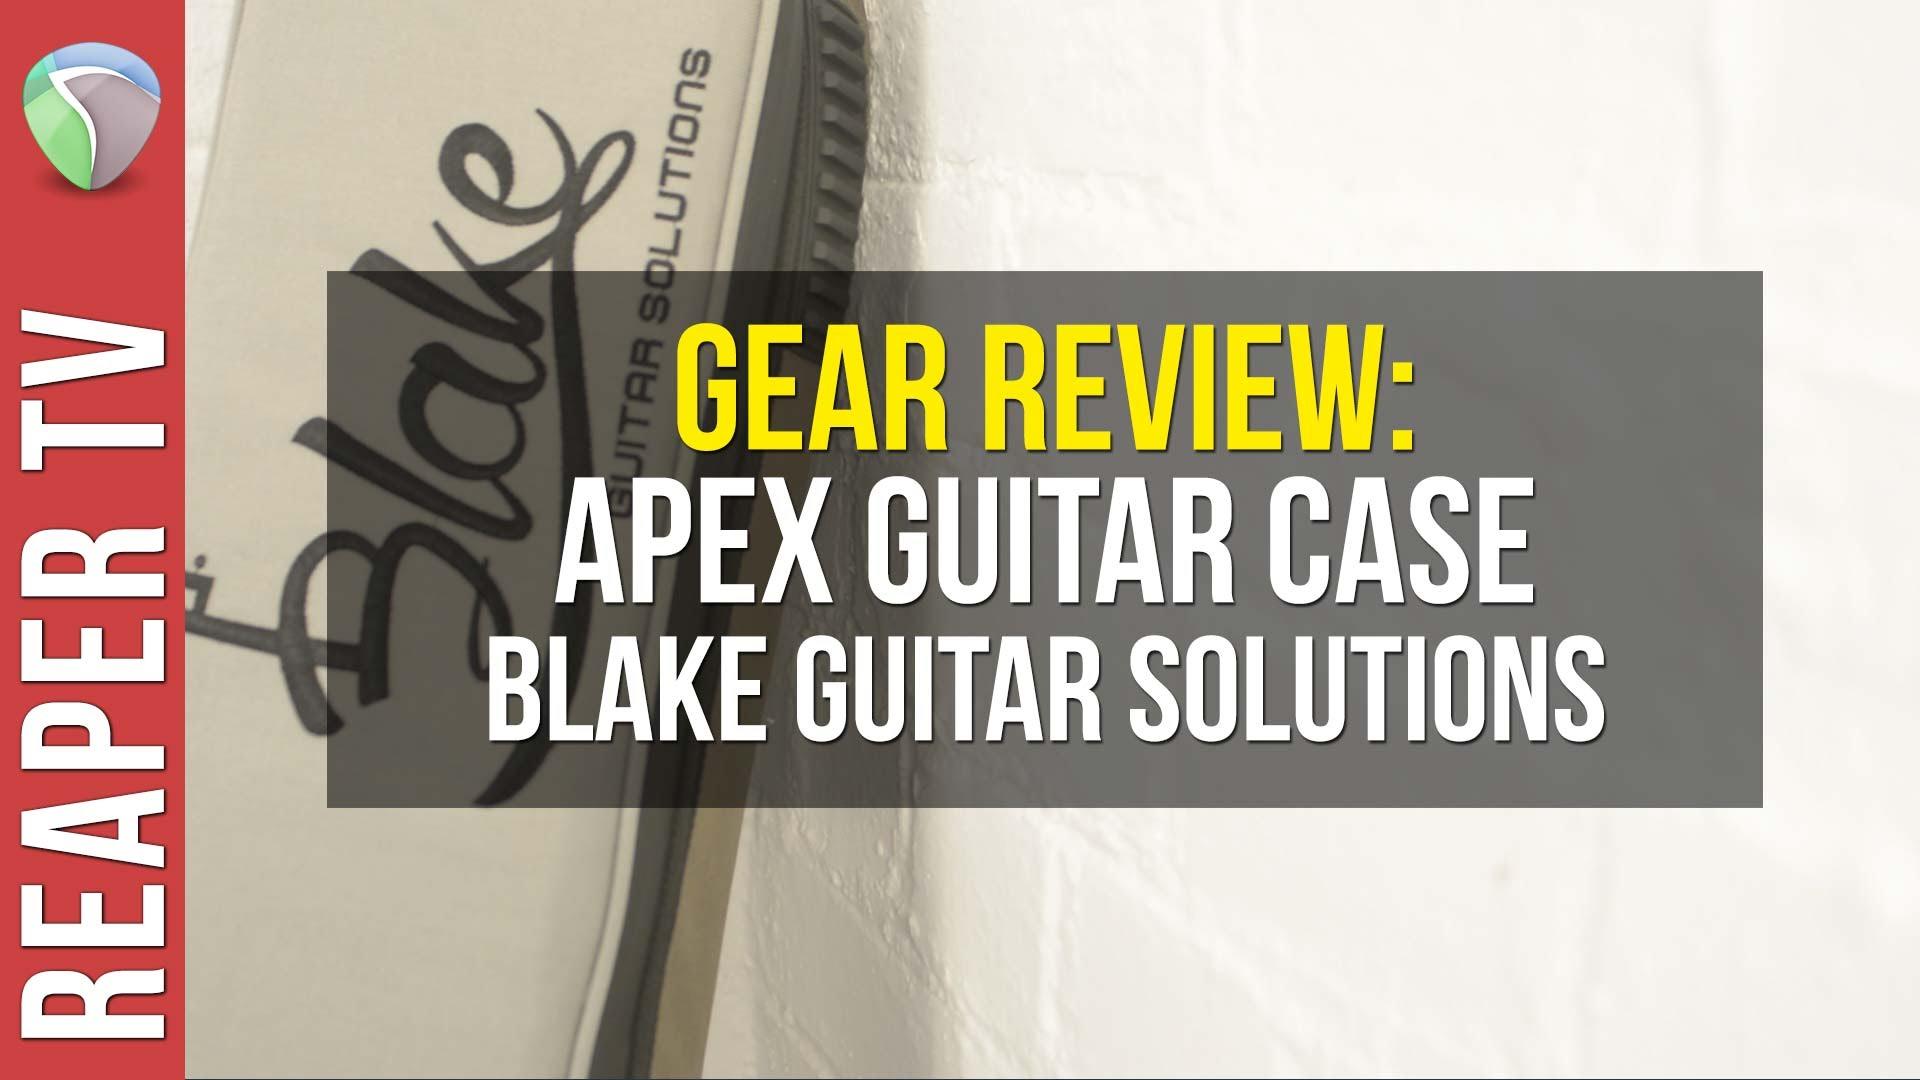 Gear Review: Apex Guitar Case – Blake Guitar Solutions